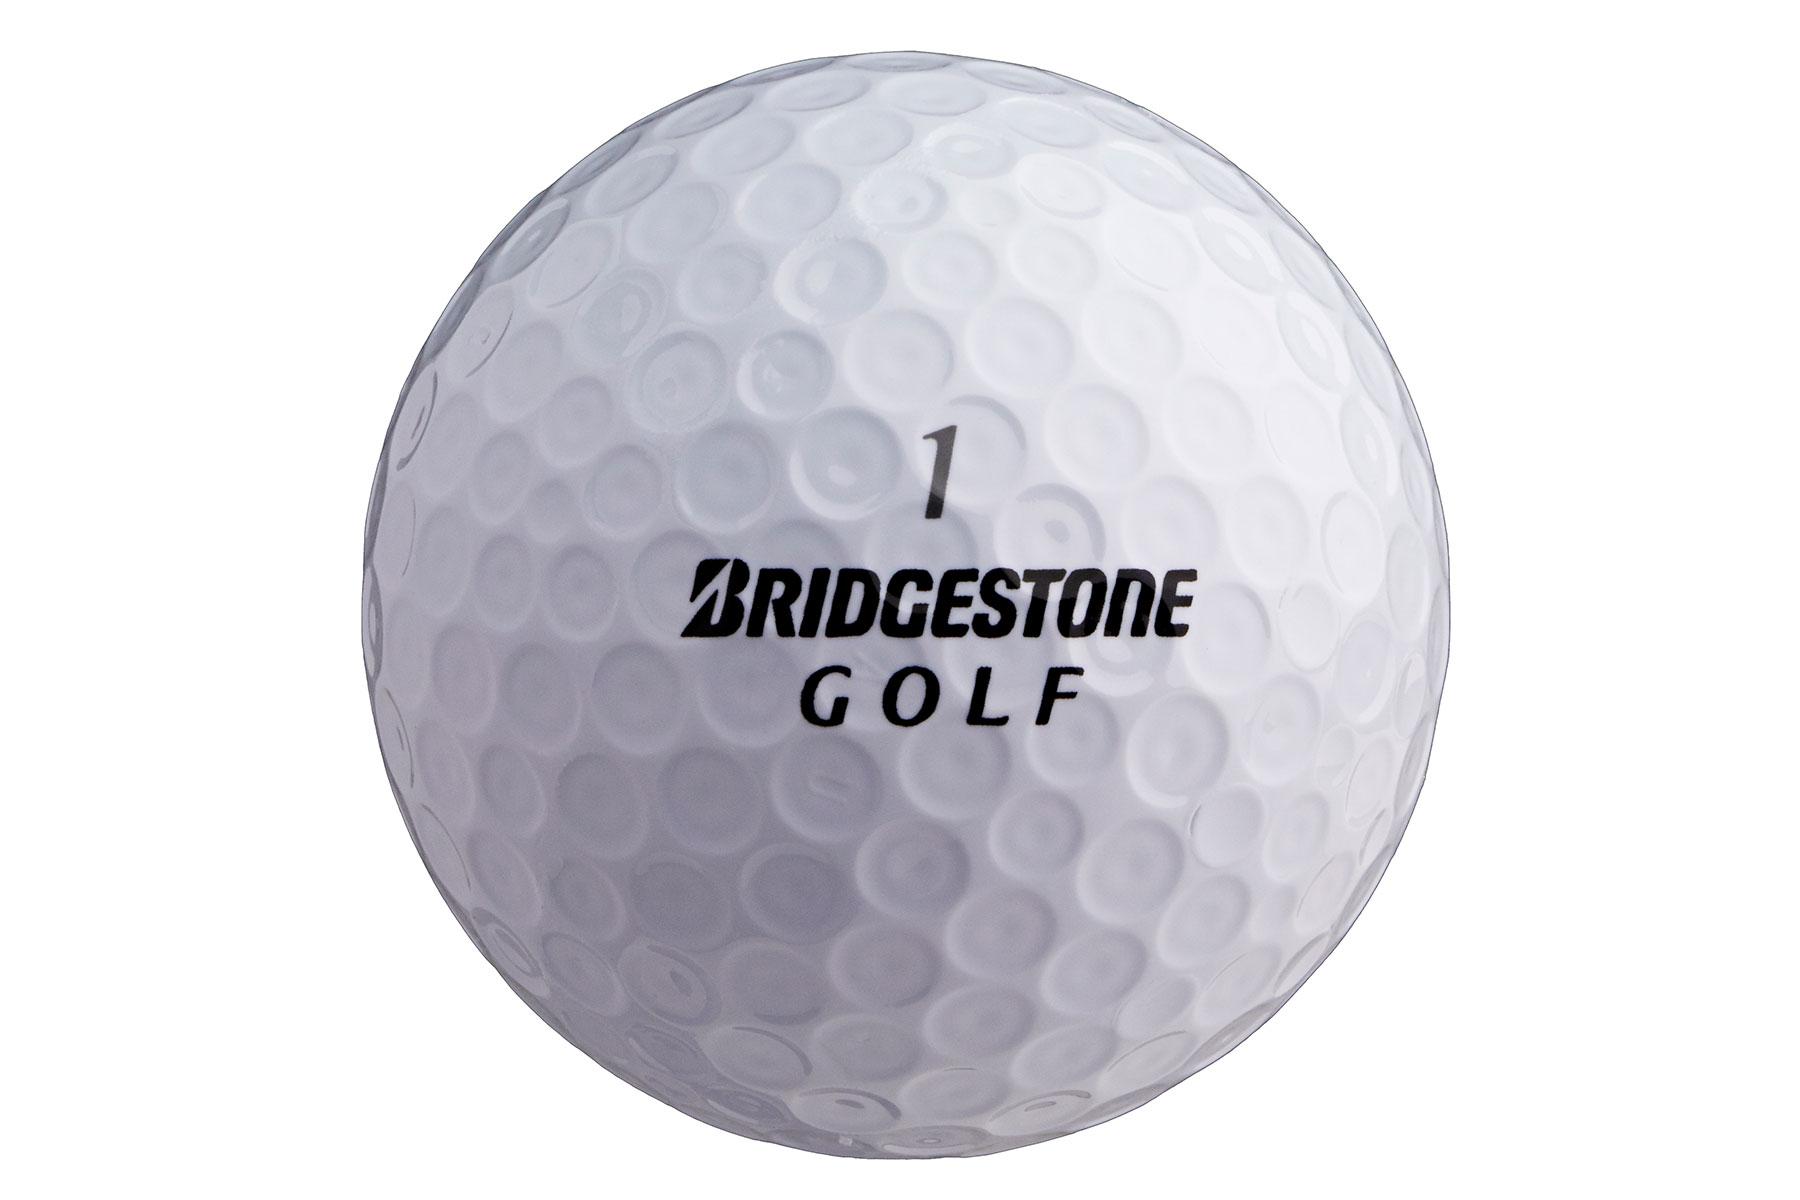 Bridgestone b rxs ball pack from american golf